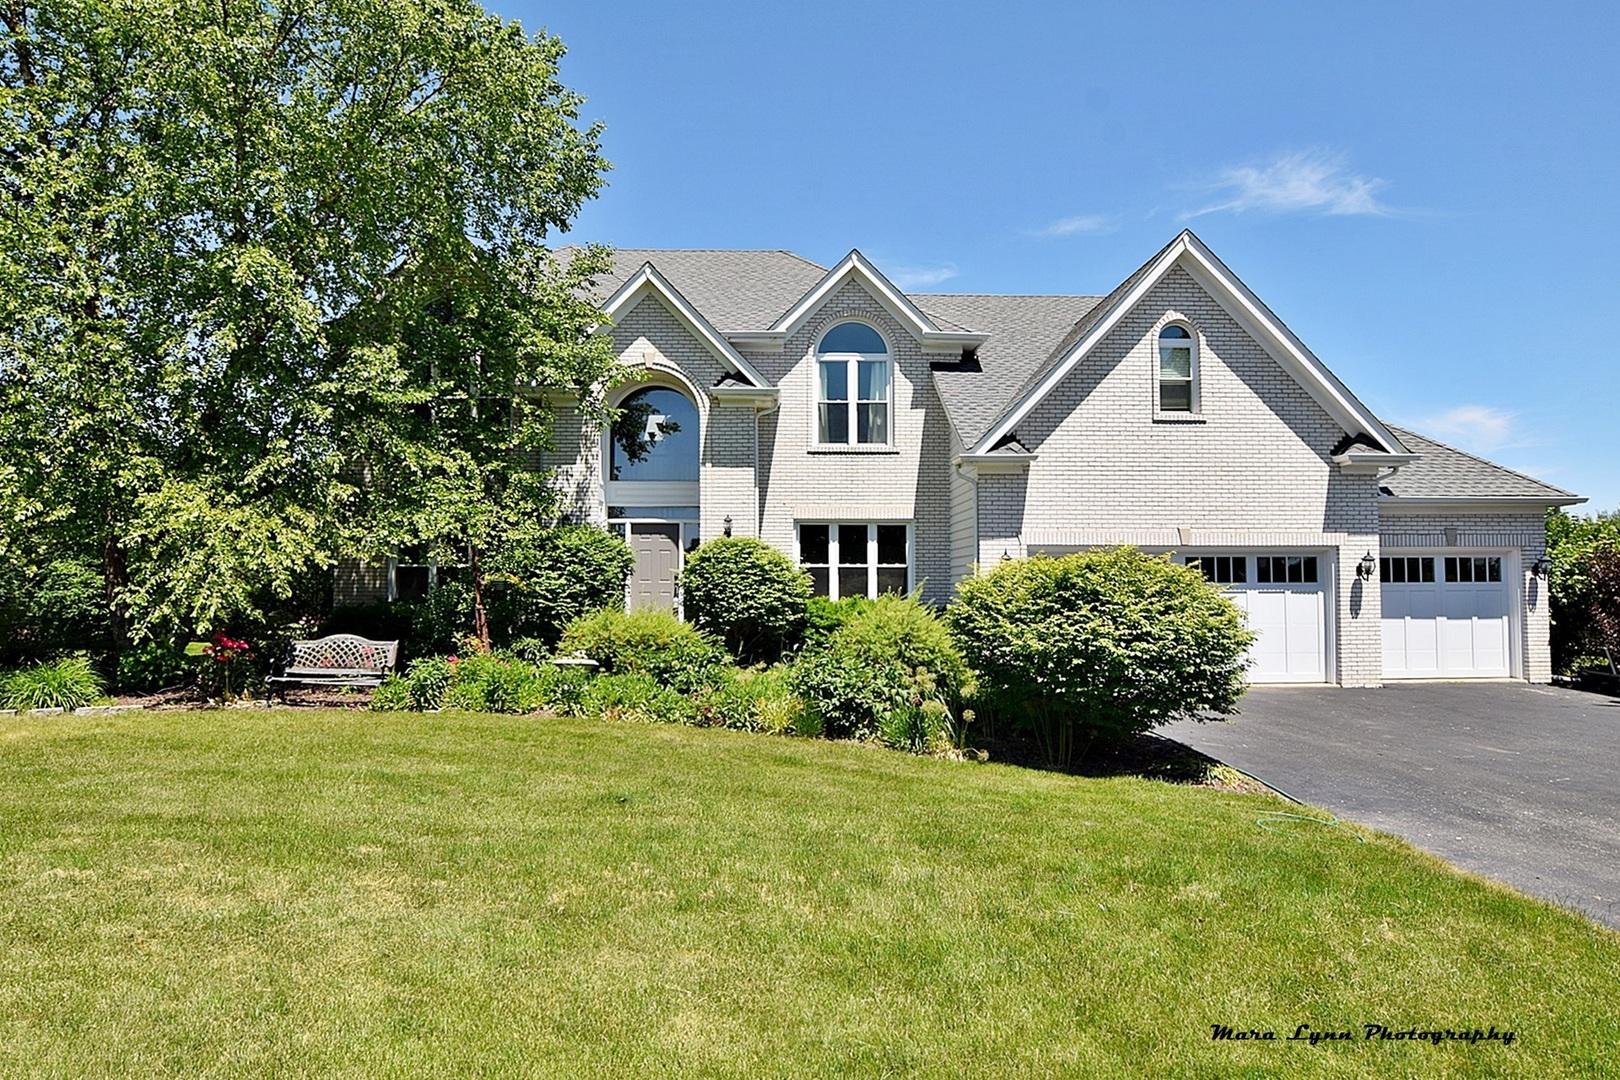 37W532 Schuster Lane, Batavia in Kane County, IL 60510 Home for Sale